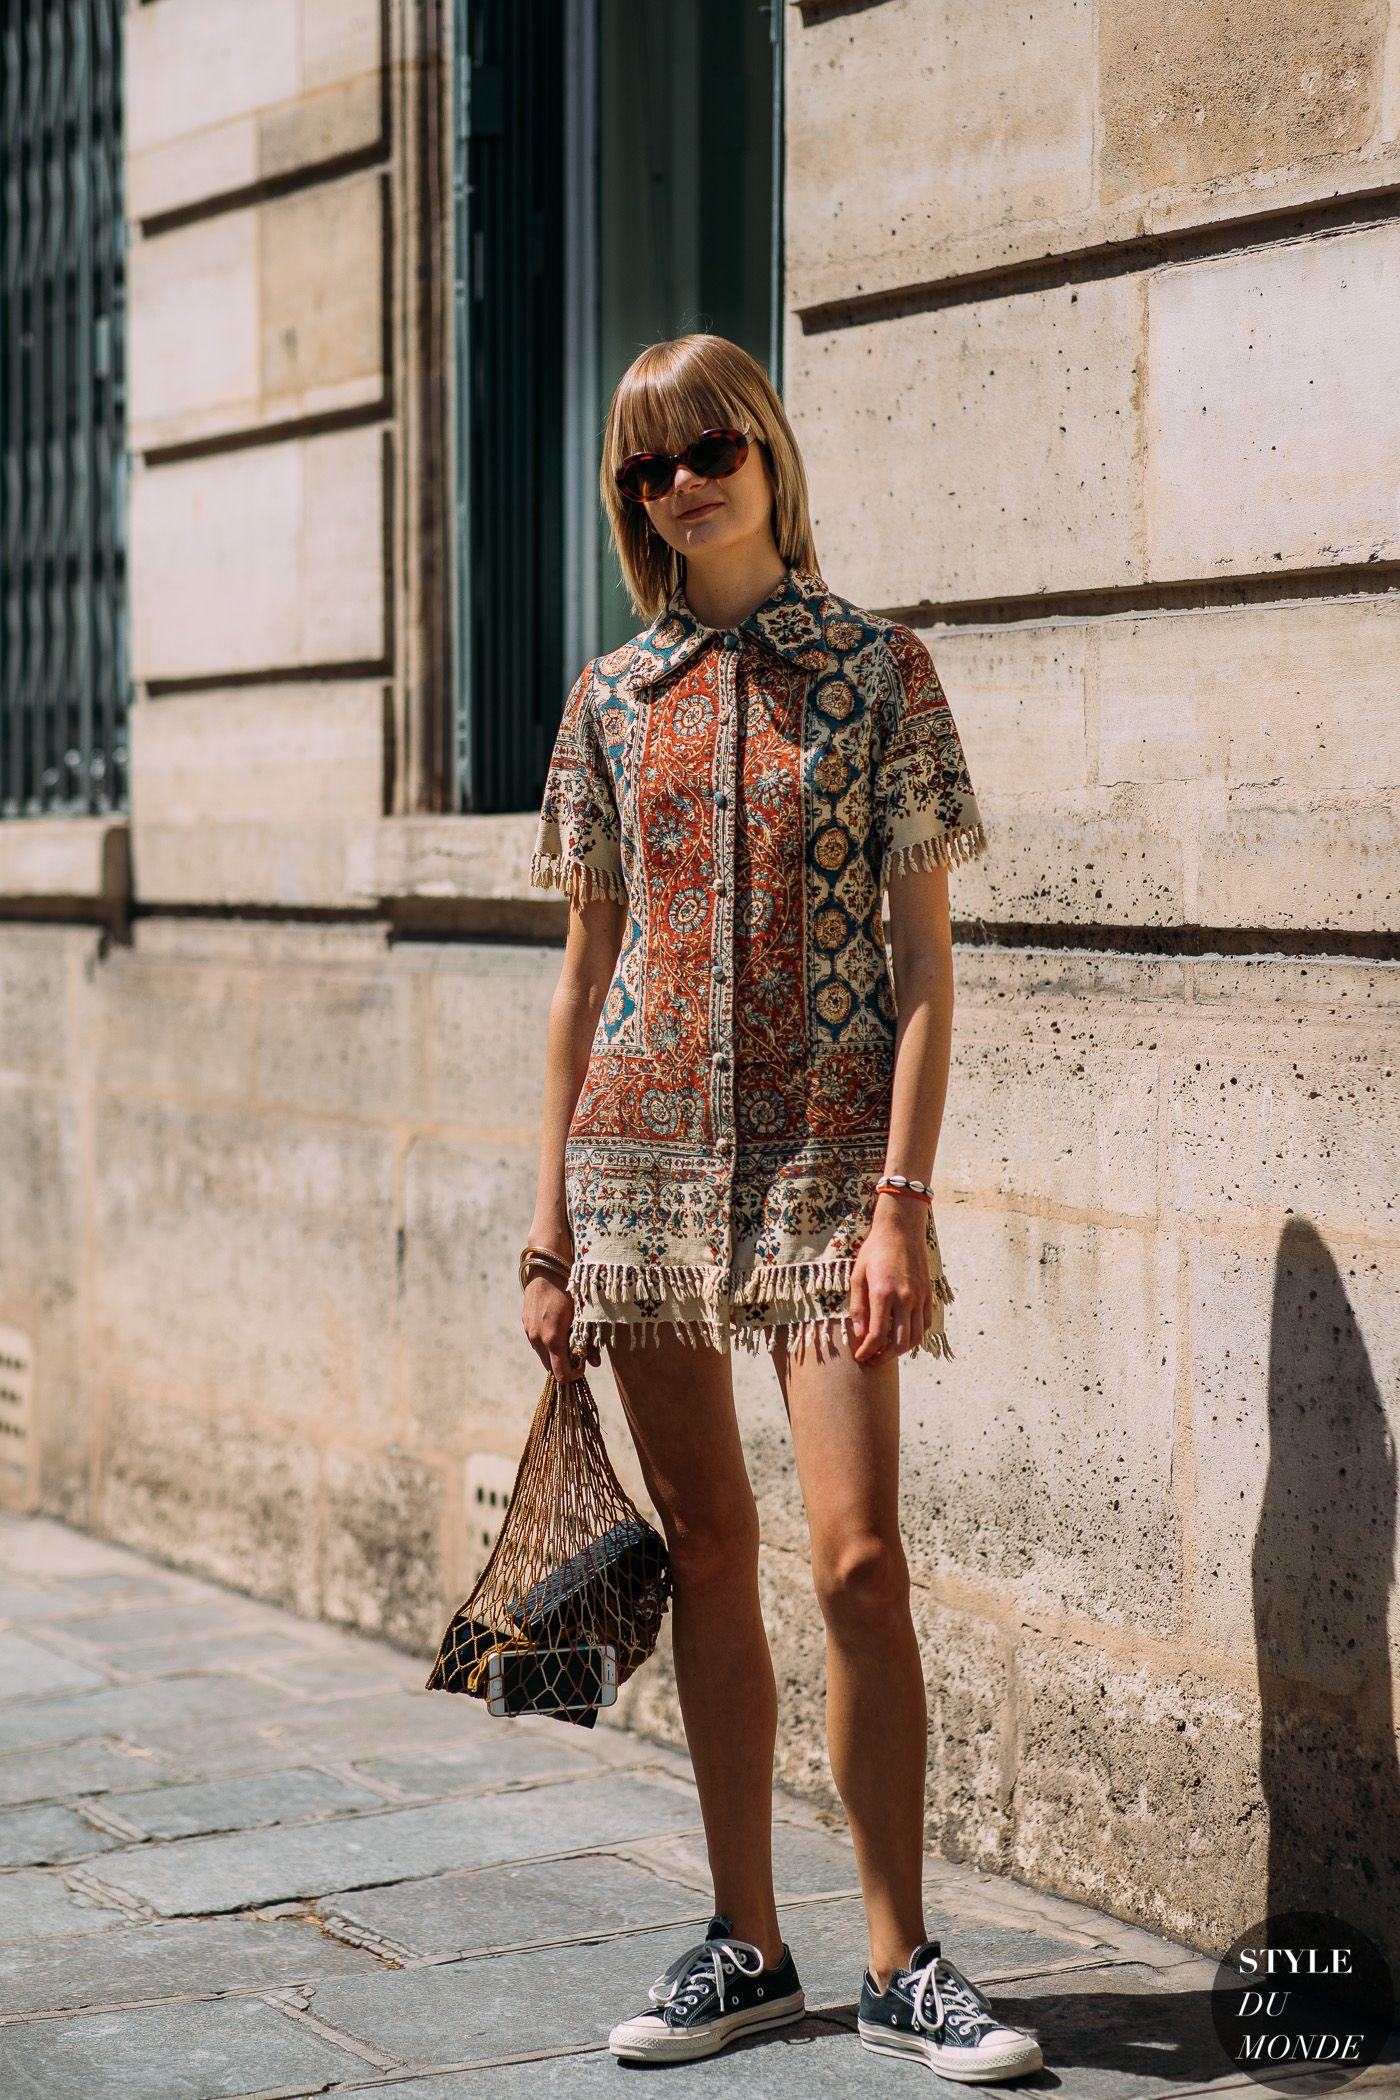 Haute Couture Fall / Winter 2018/19 Street Style: Caroline Schurch - STYLE DU MONDE | Street Style Street Fashion Photos Caroline Schurch #bohostreetstyle